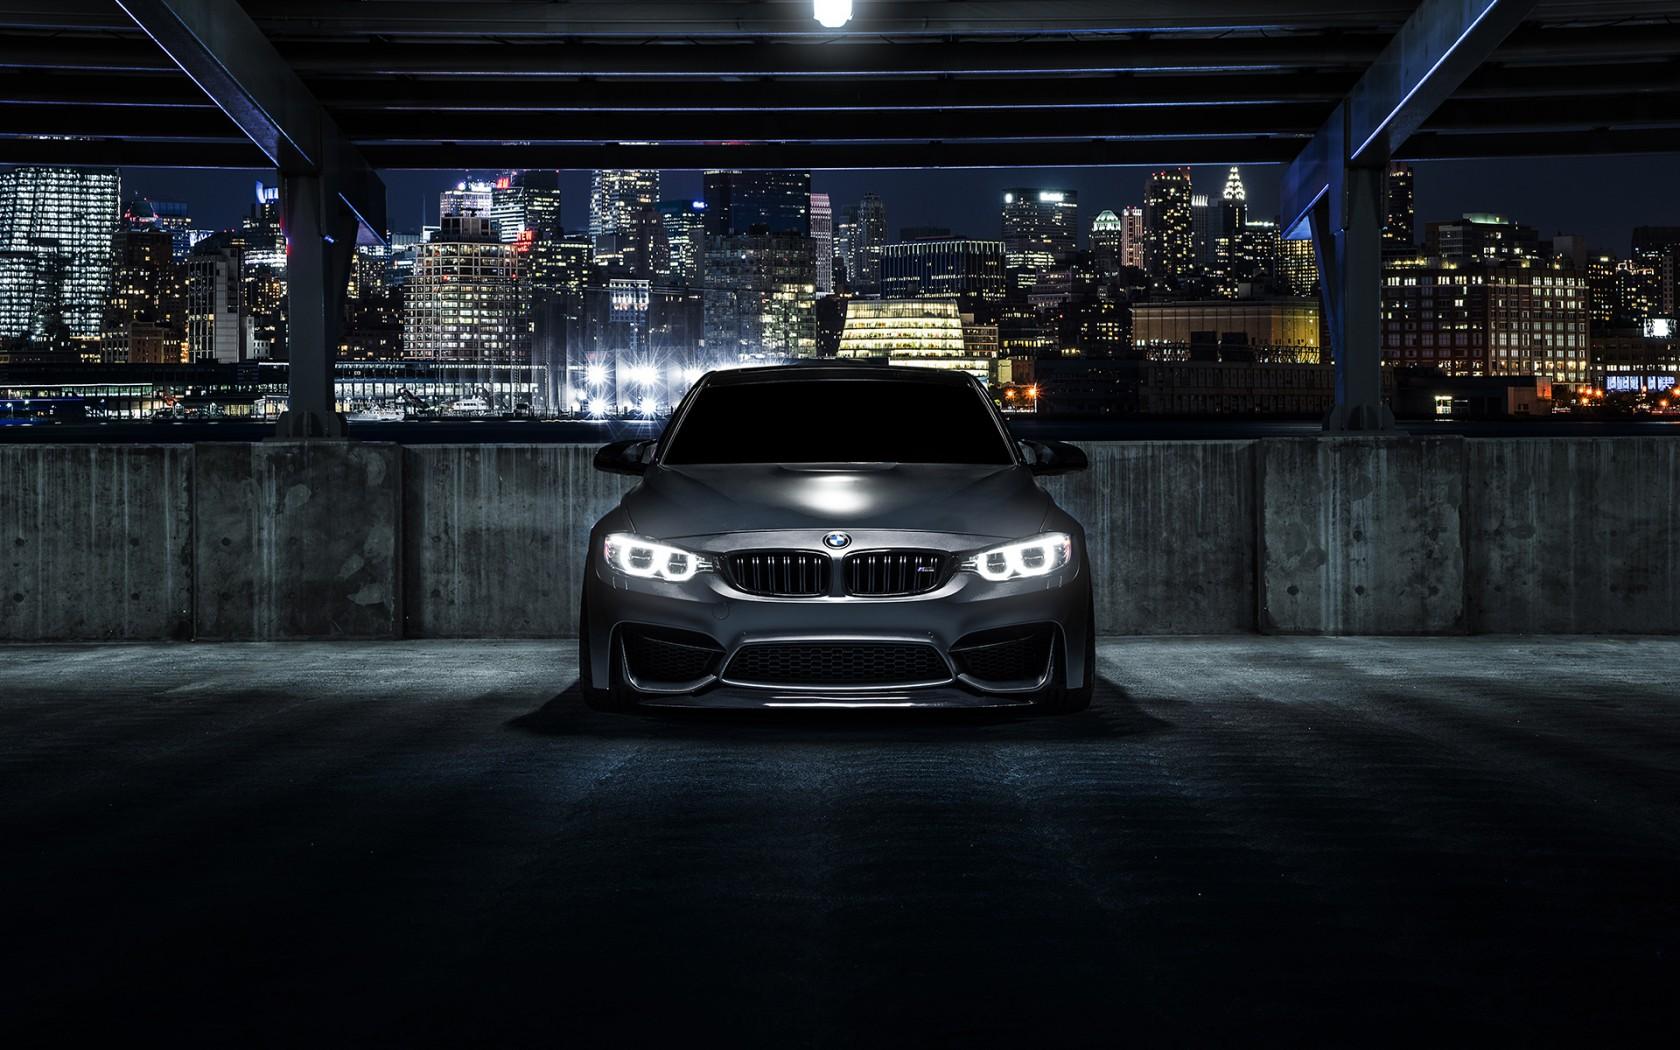 BMW M3 Mode Carbon Sonic Motorsport Wallpaper | HD Car ...